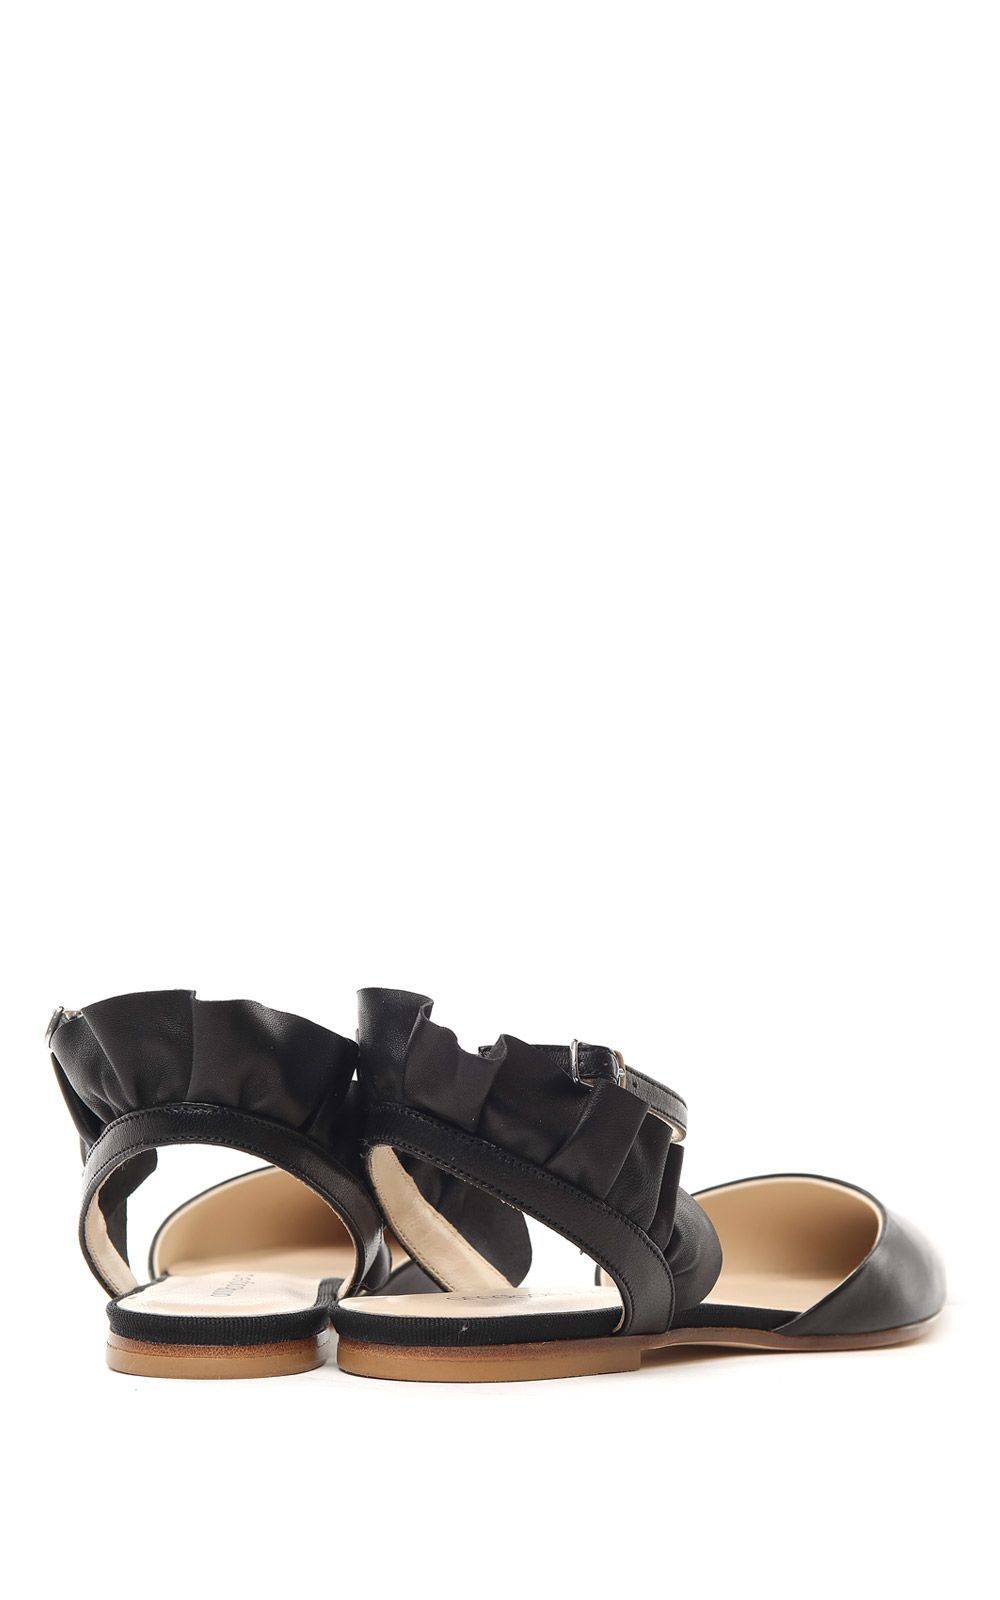 Malika uched leather ballet flats Anna Baiguera vd5Qt